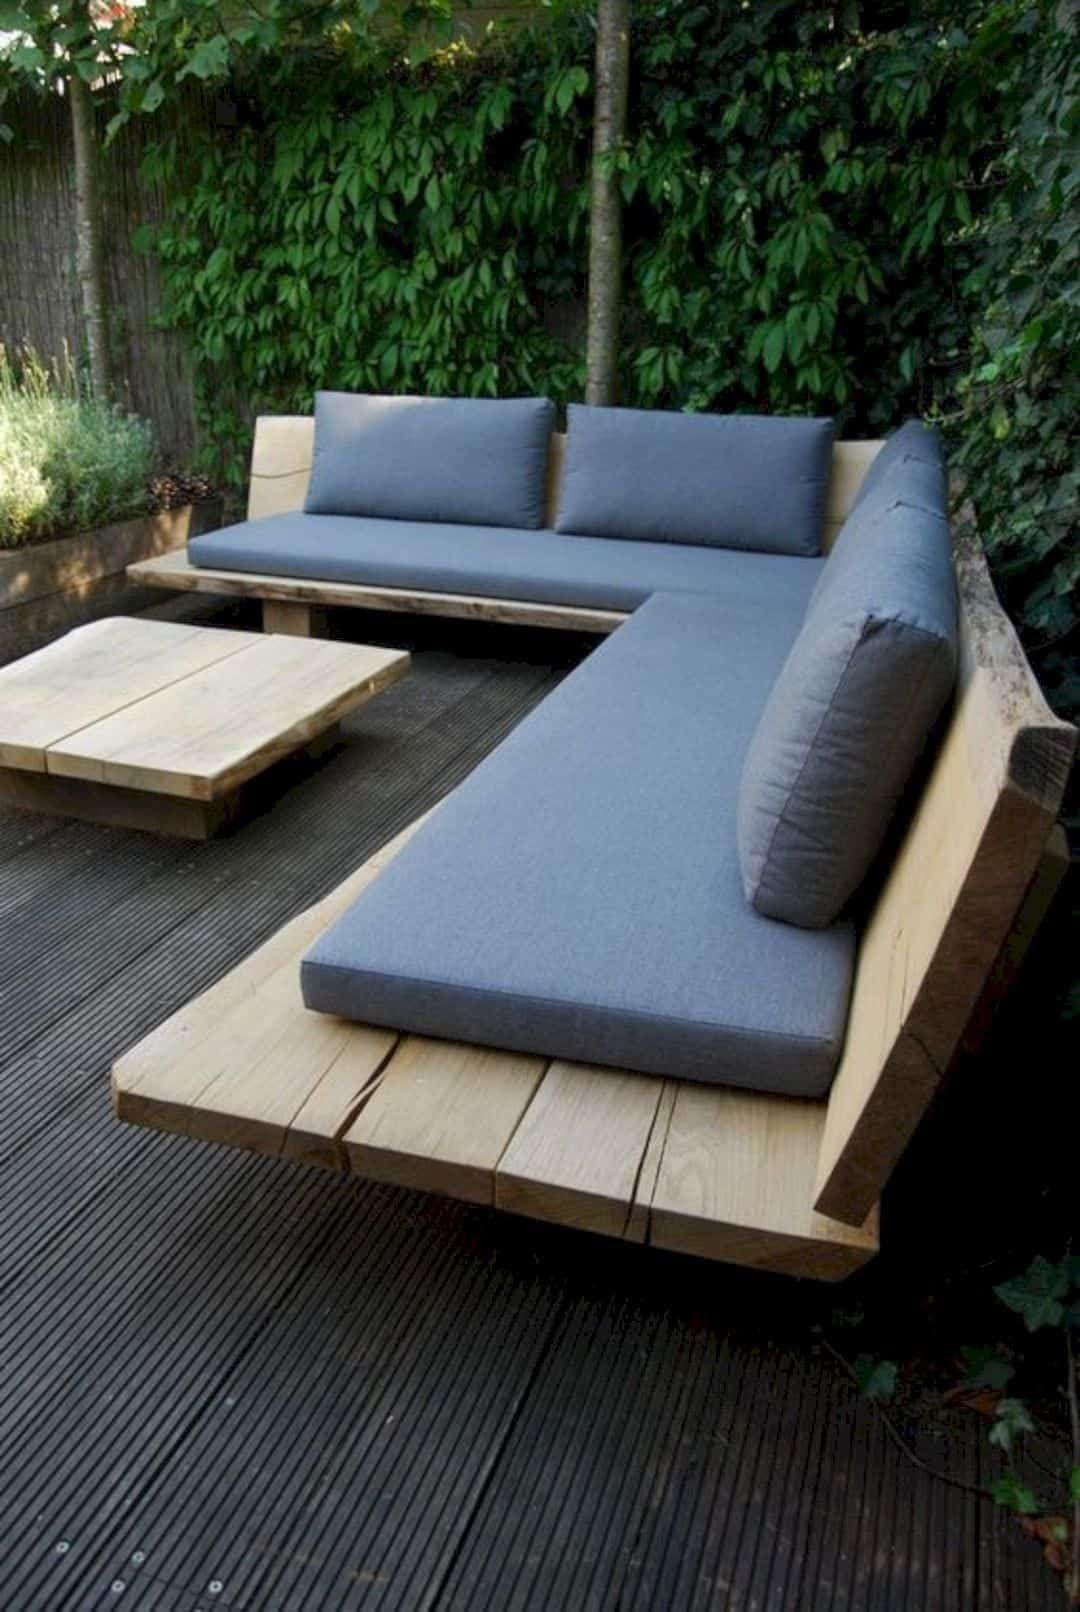 7 Incredible Furniture Ideas to Transform Your Backyard  Outdoor